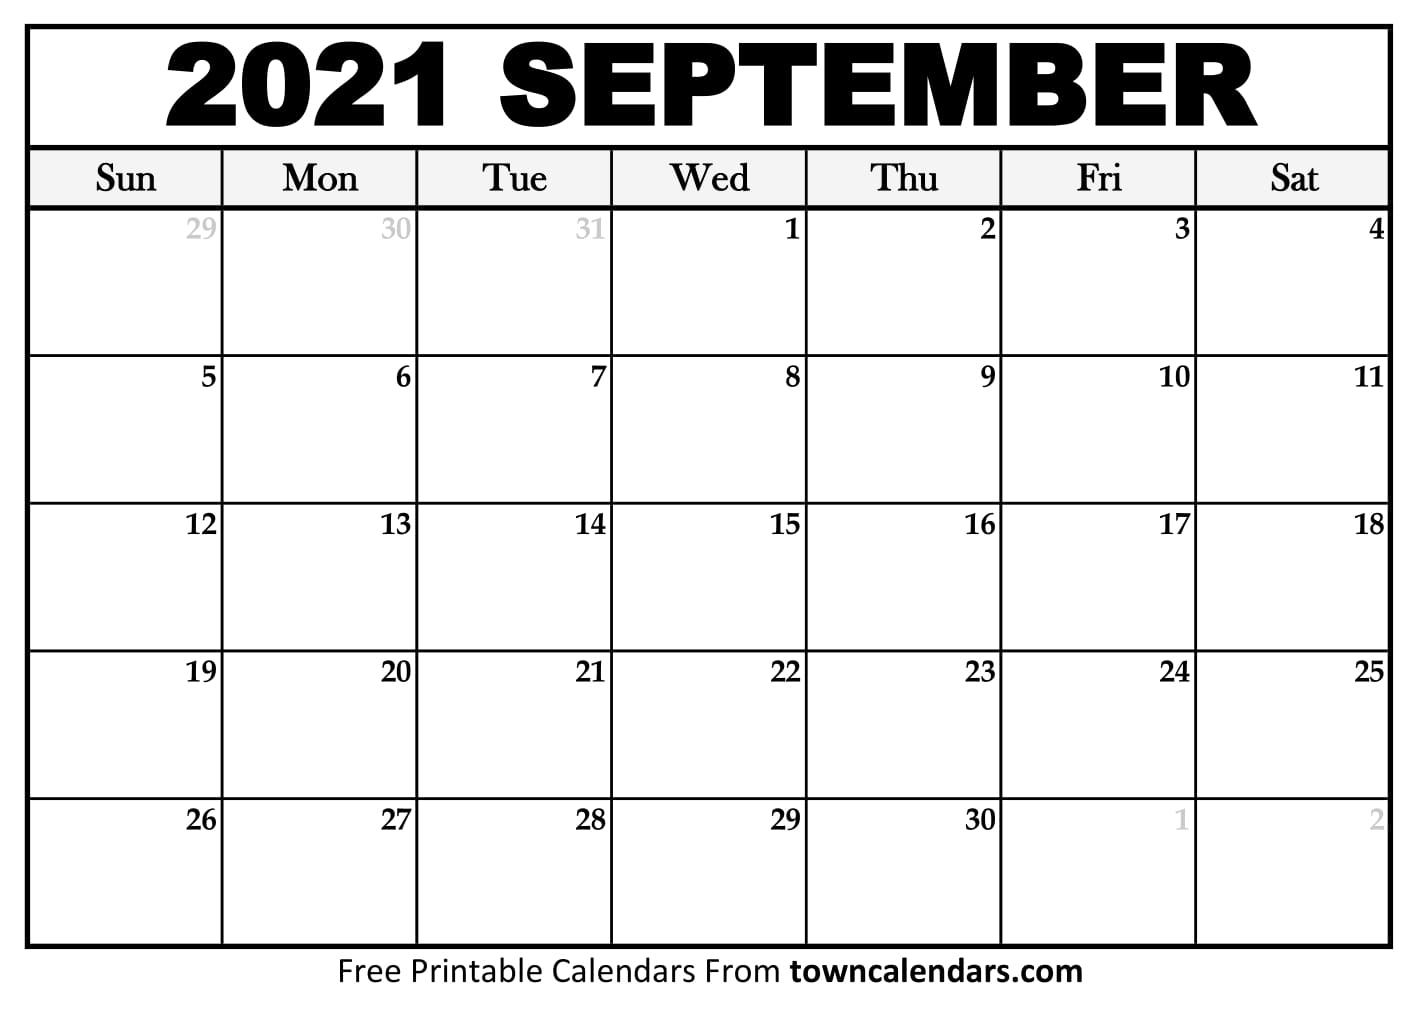 Printable September 2021 Calendar - Towncalendars